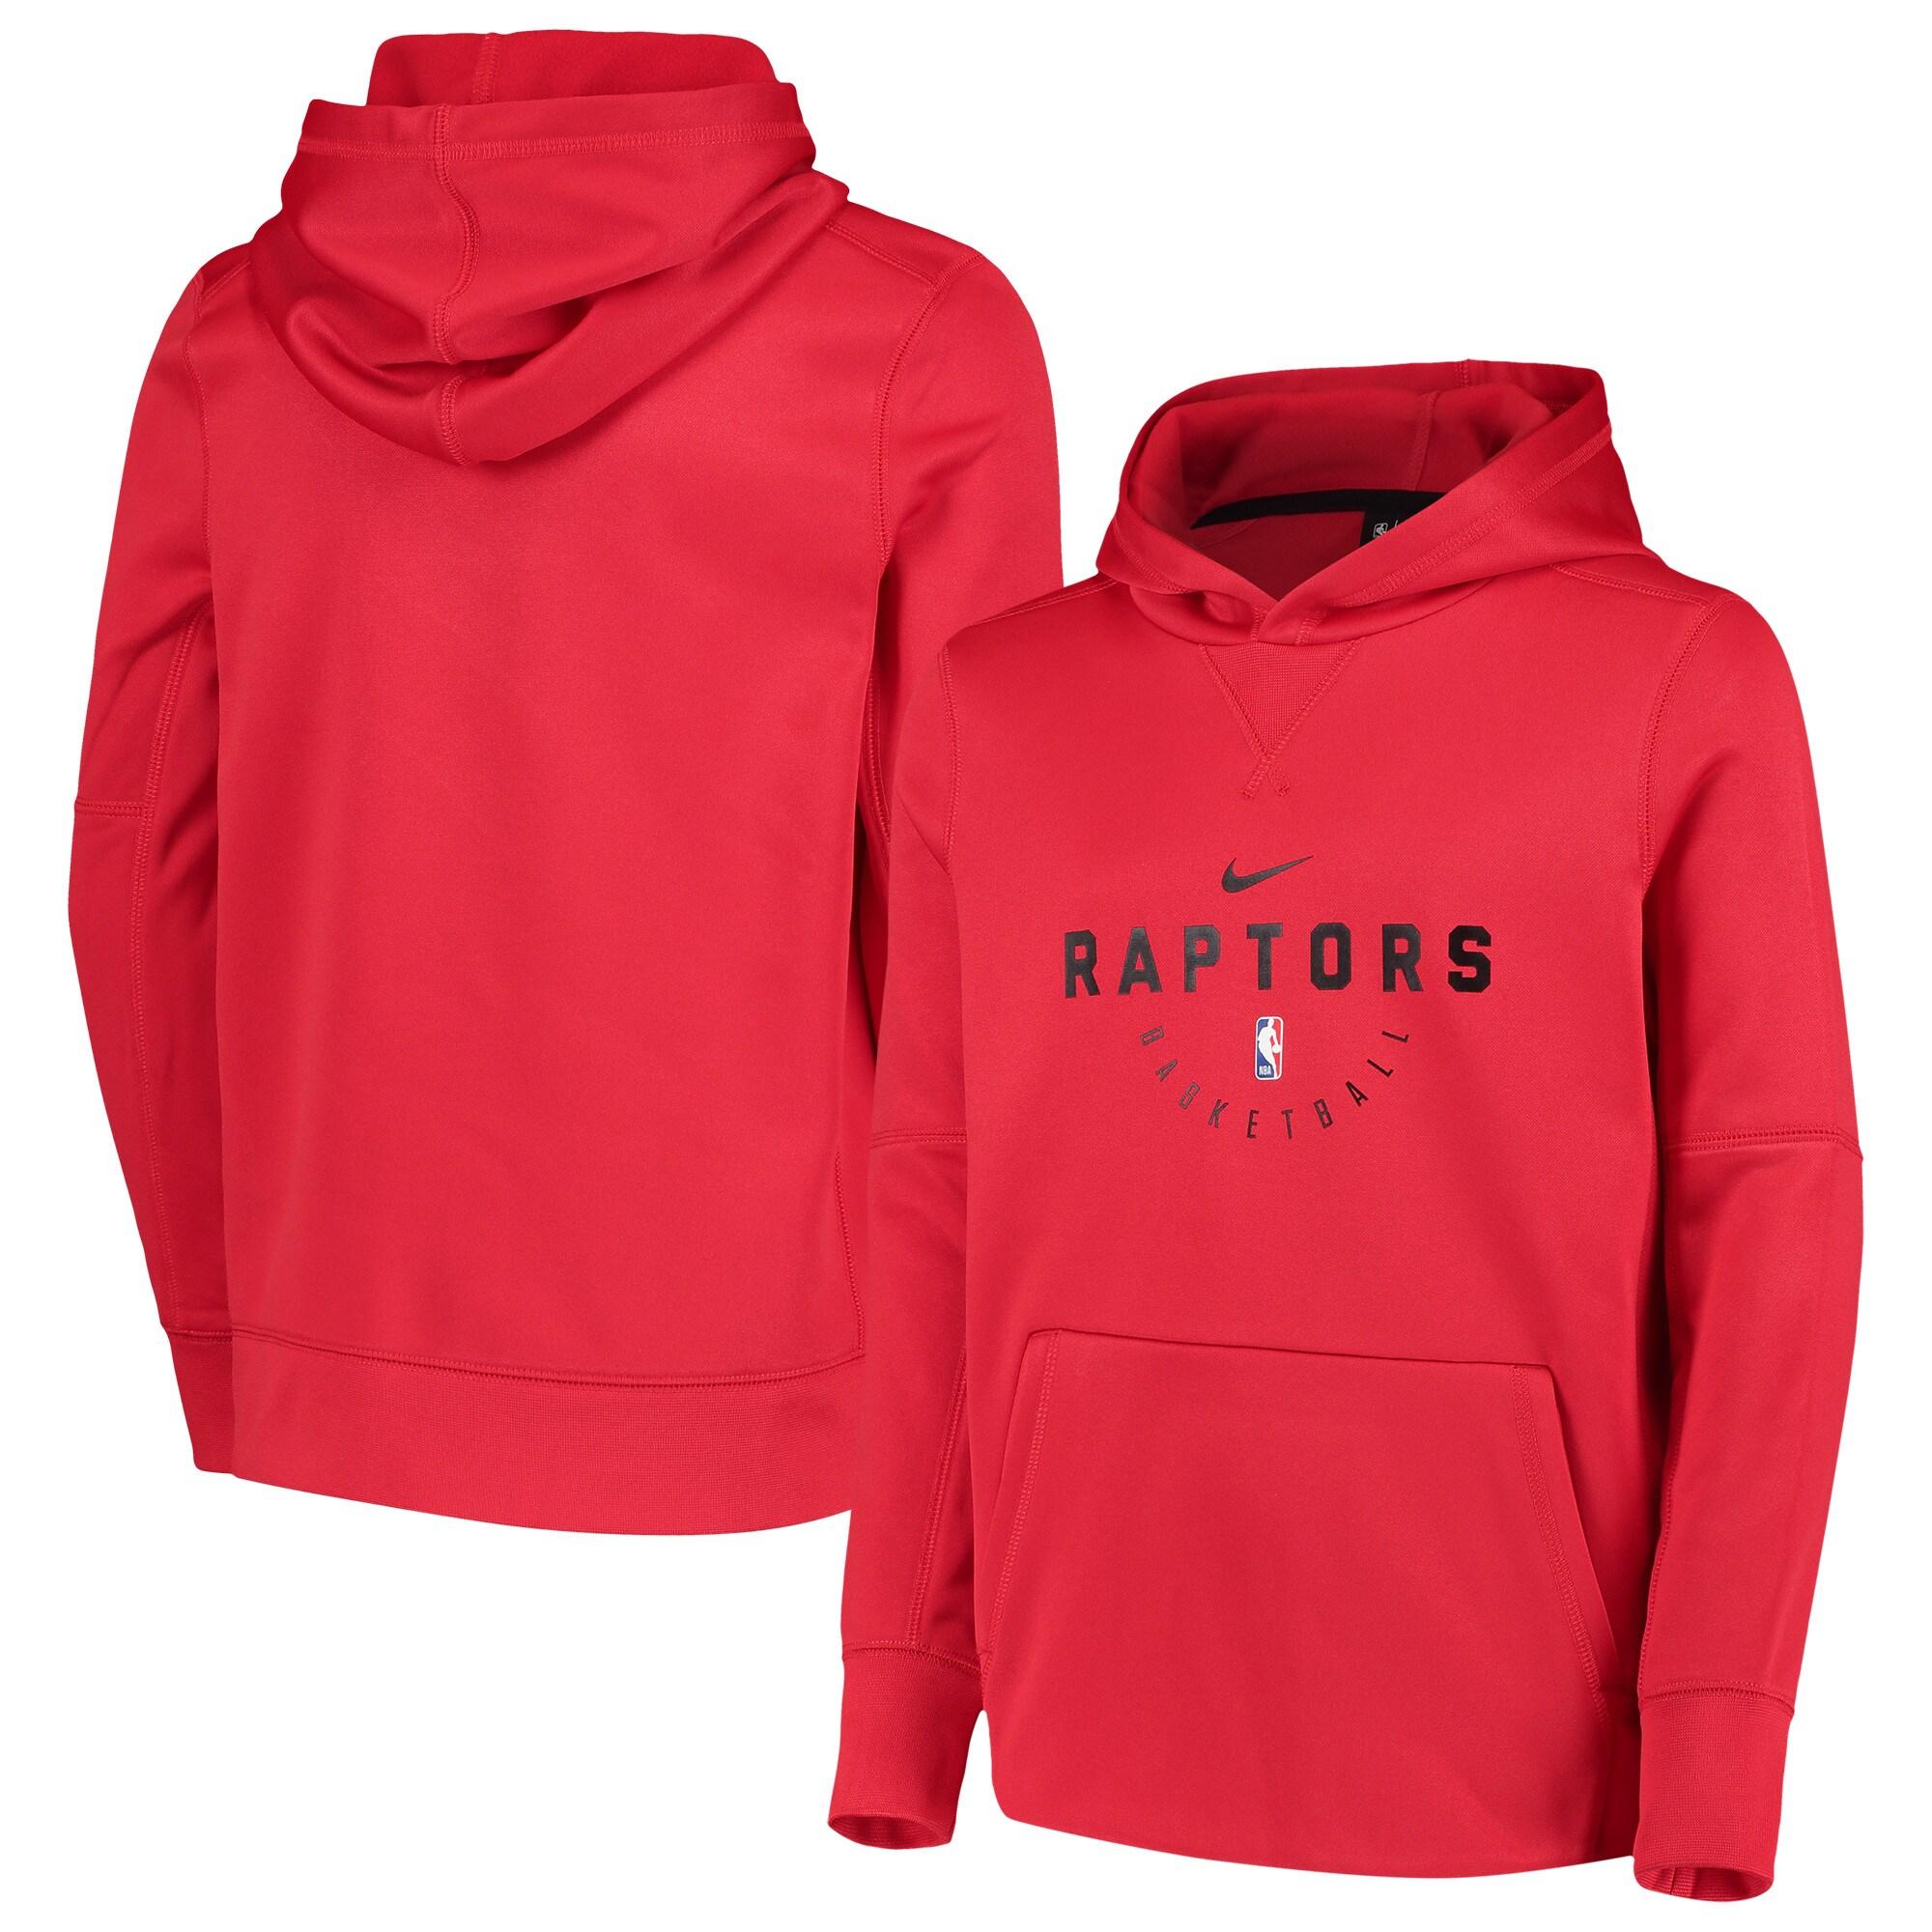 Toronto Raptors Nike Youth Spotlight Performance Hoodie - Red